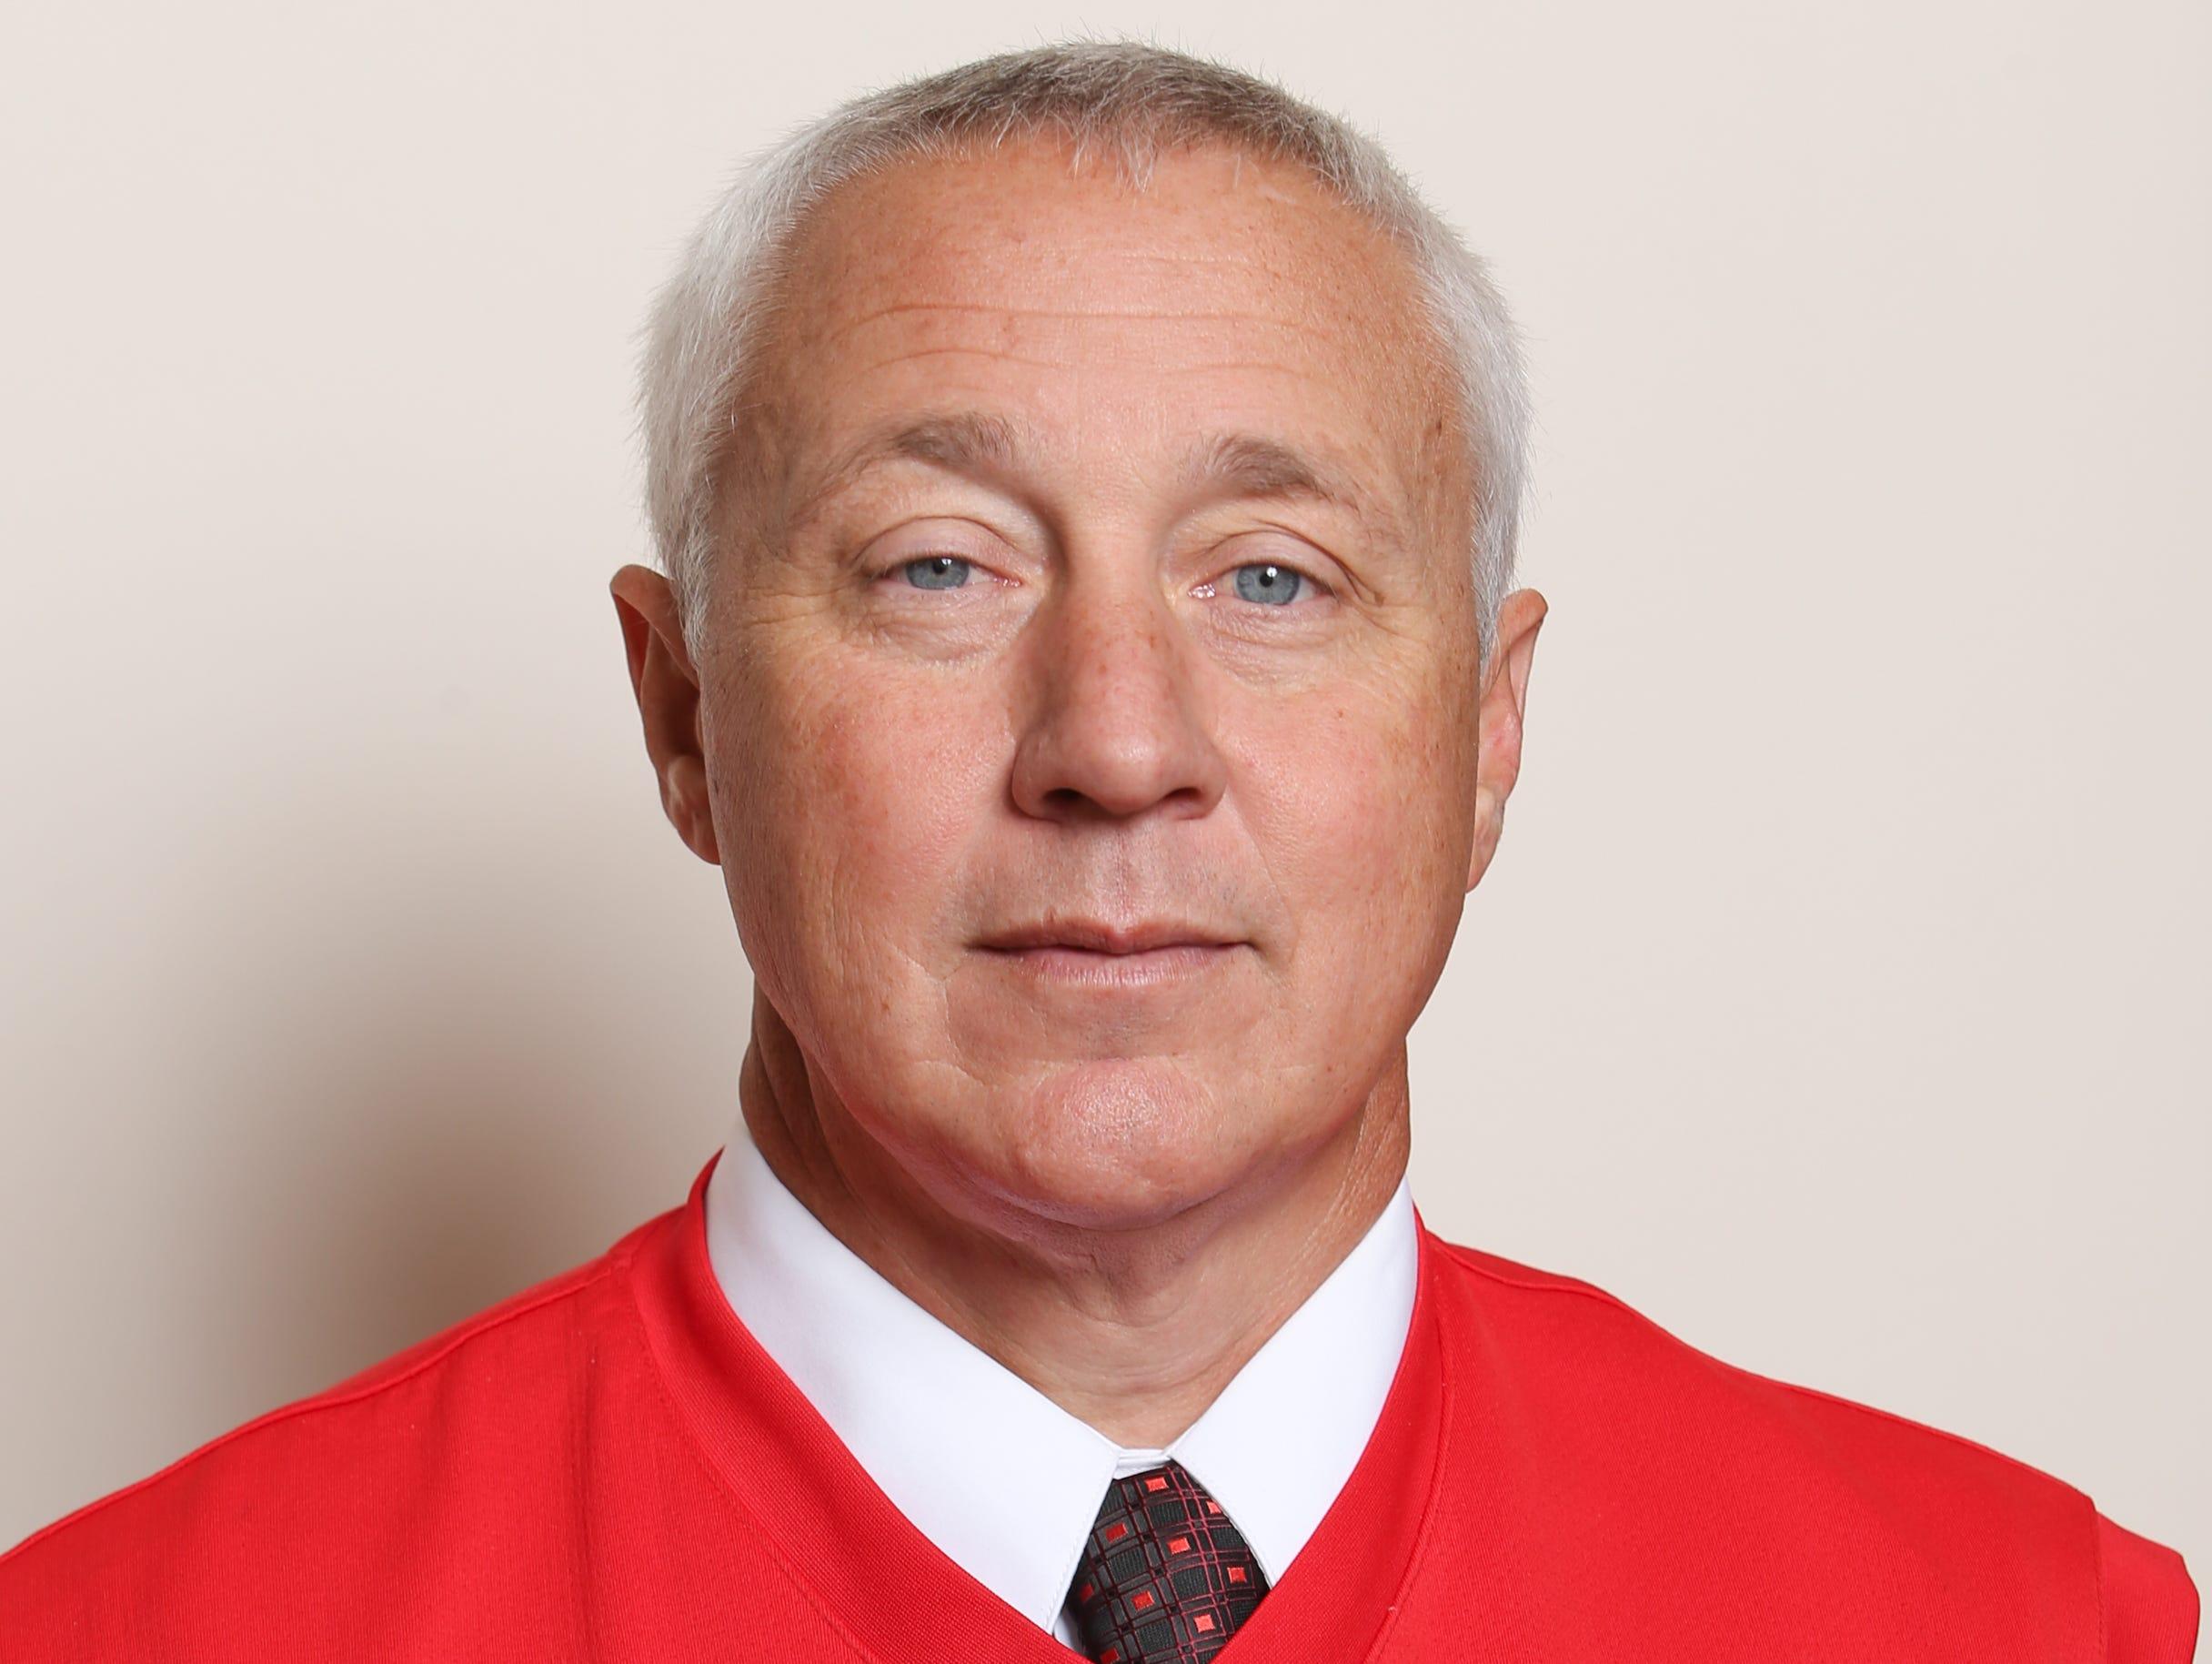 Petal coach Marcus Boyles